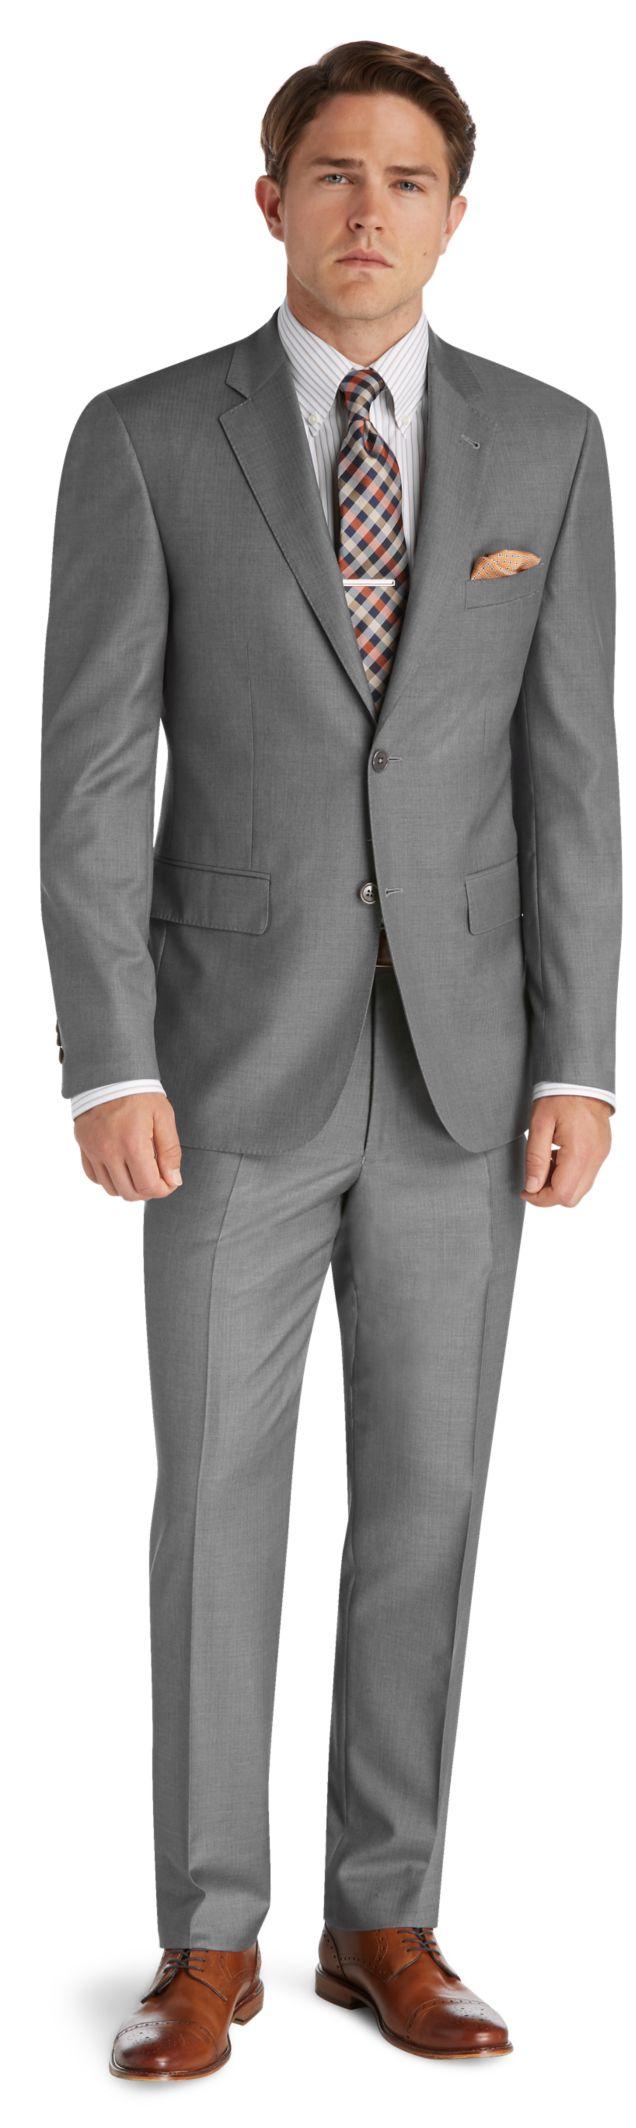 Dark Grey or Medium Grey suit? : malefashionadvice